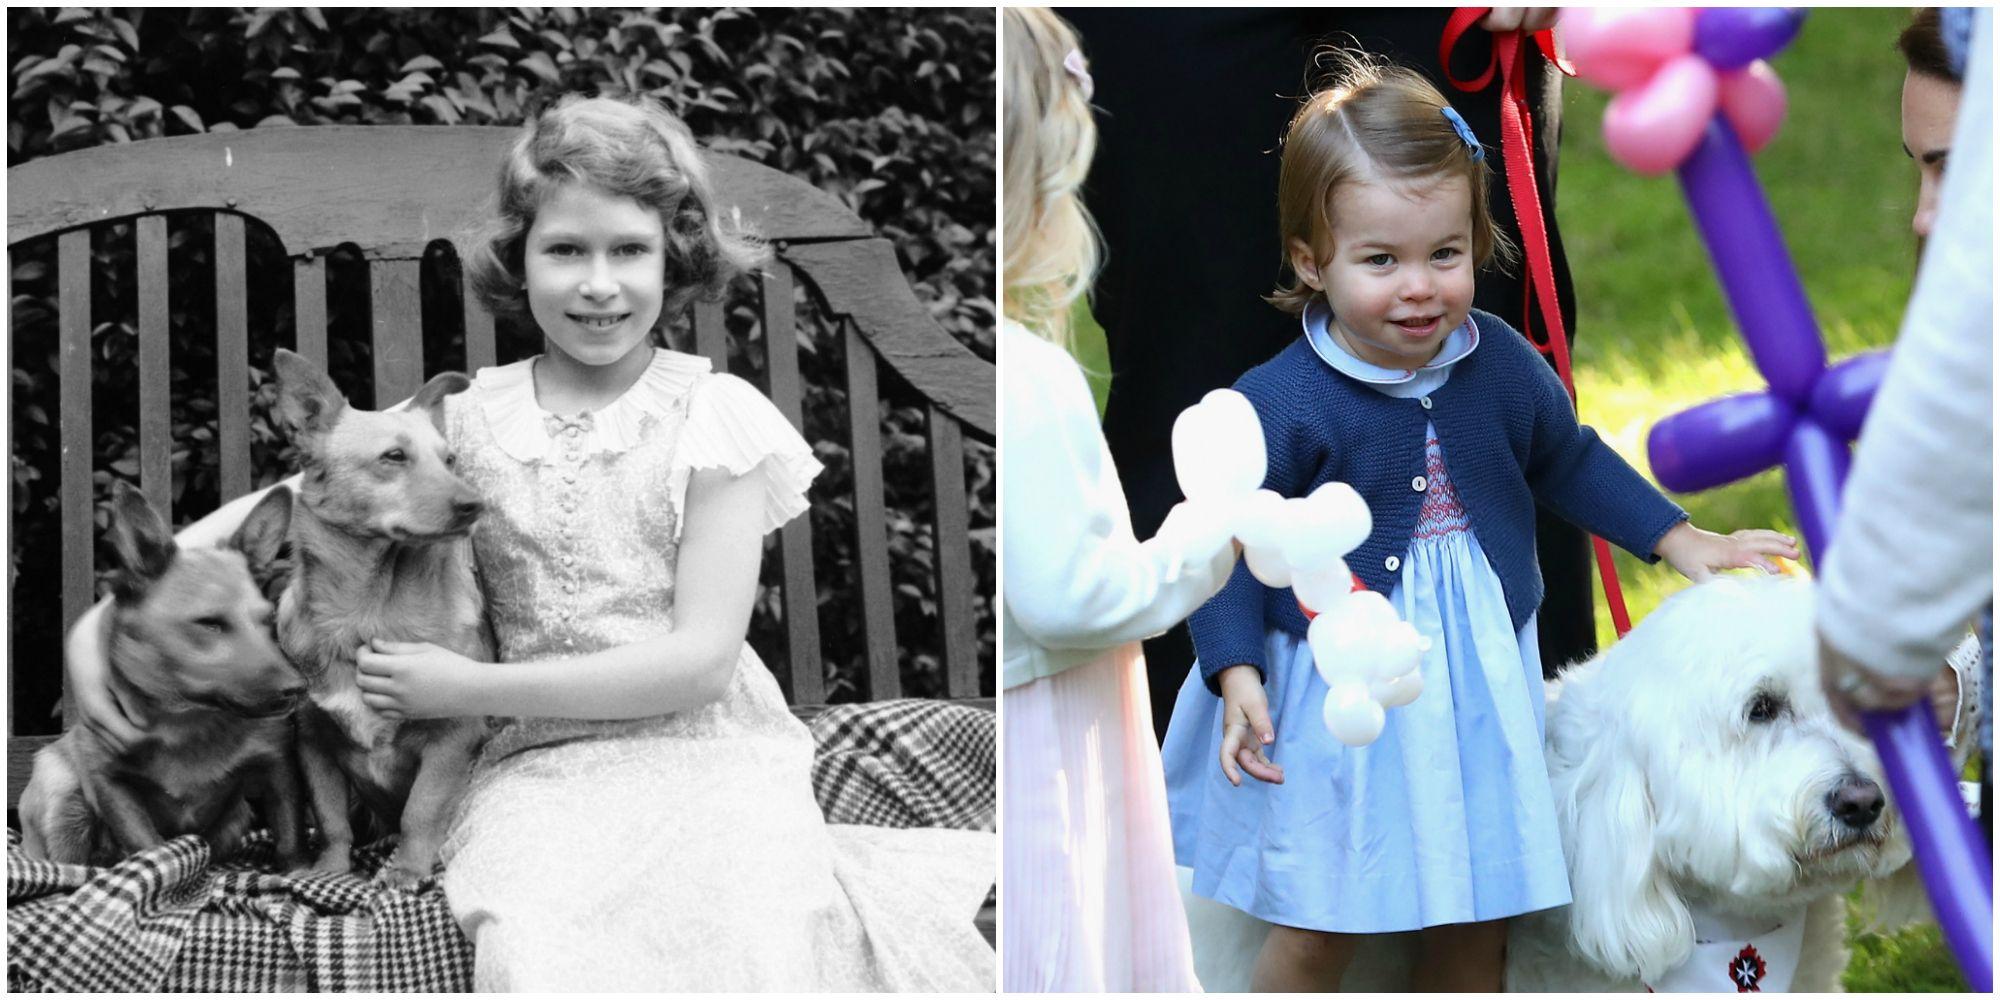 queen elizabeth ii and princess charlotte